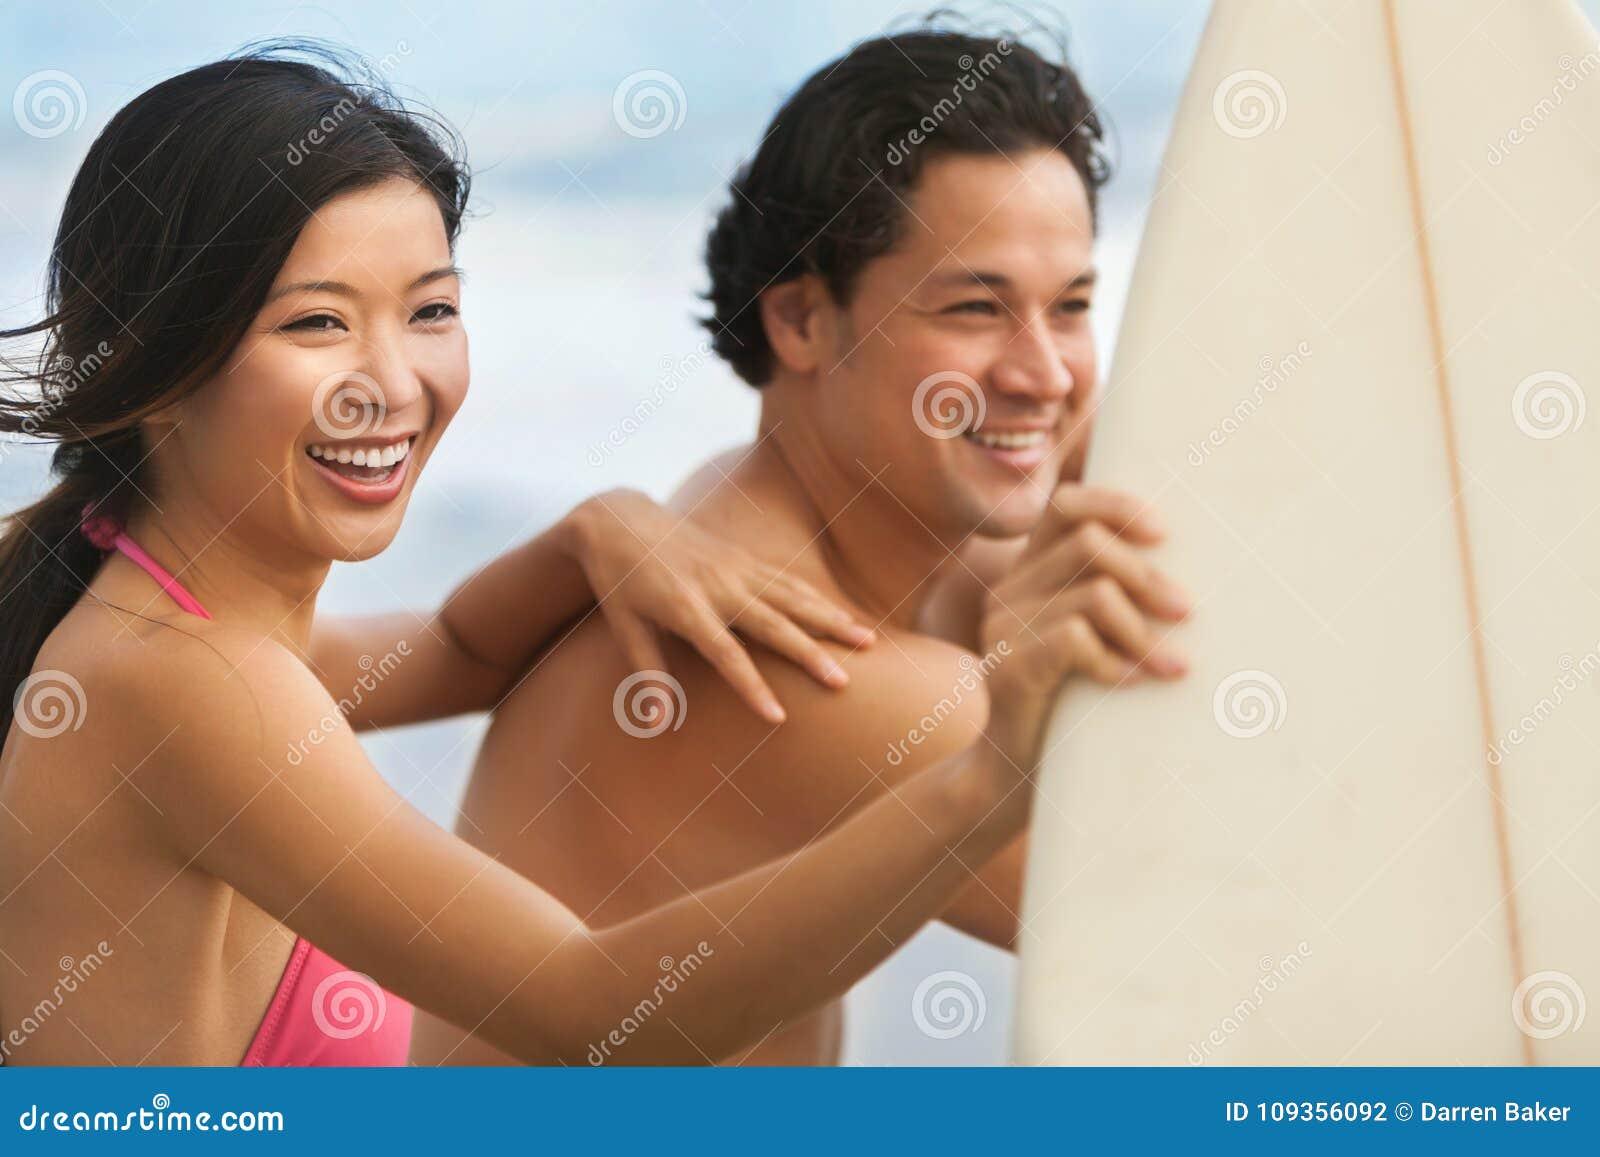 internazionale Christian single dating